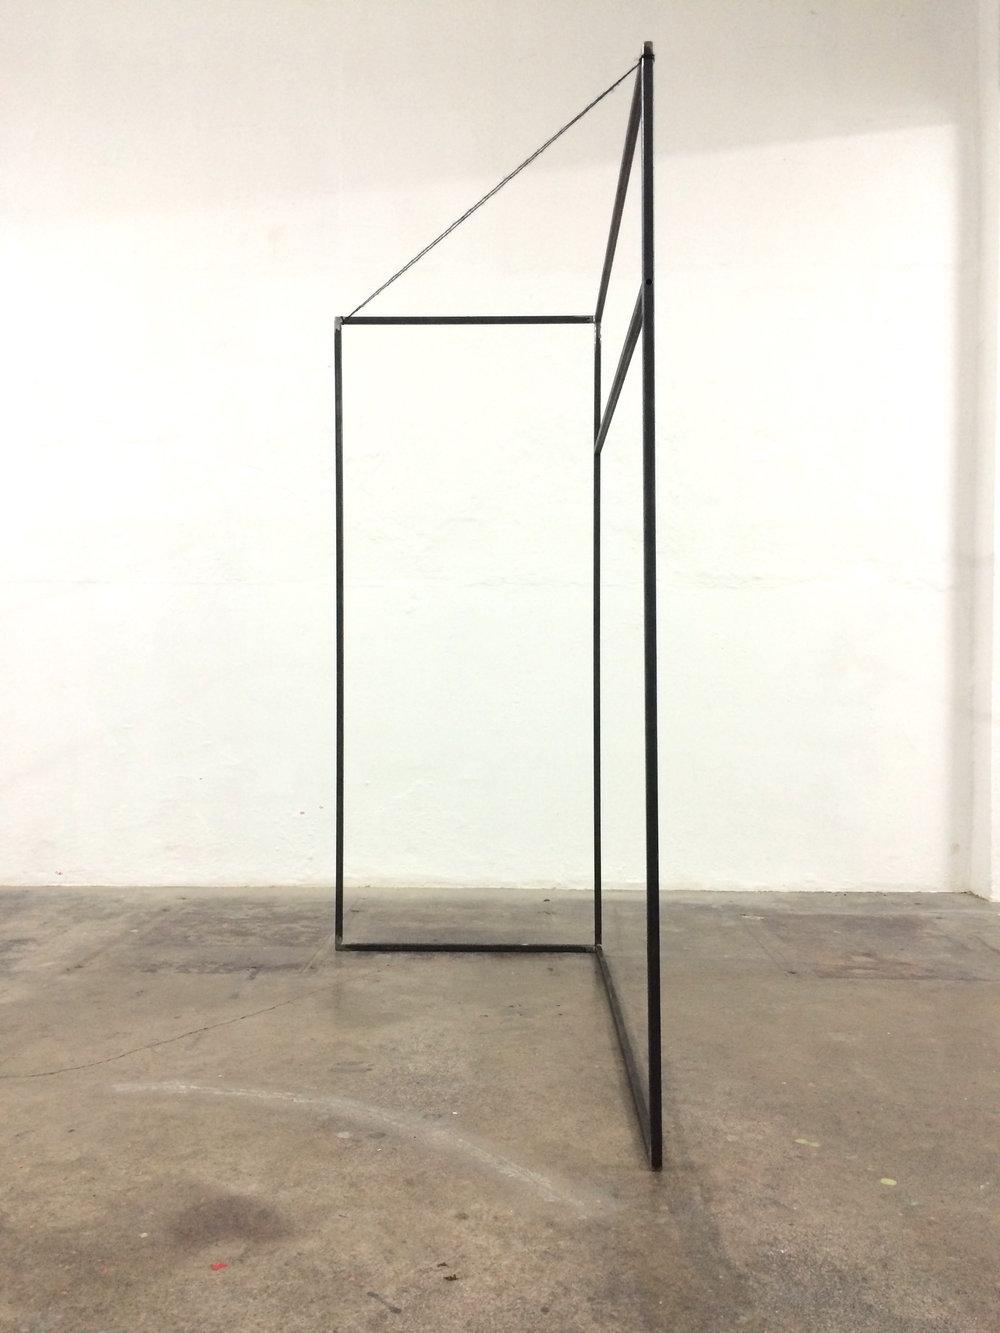 Rosalind Davis Haus Konstructiv. ASC Project Space. Steel and thread. Photo 26-02-2017, 19 46 39.jpg